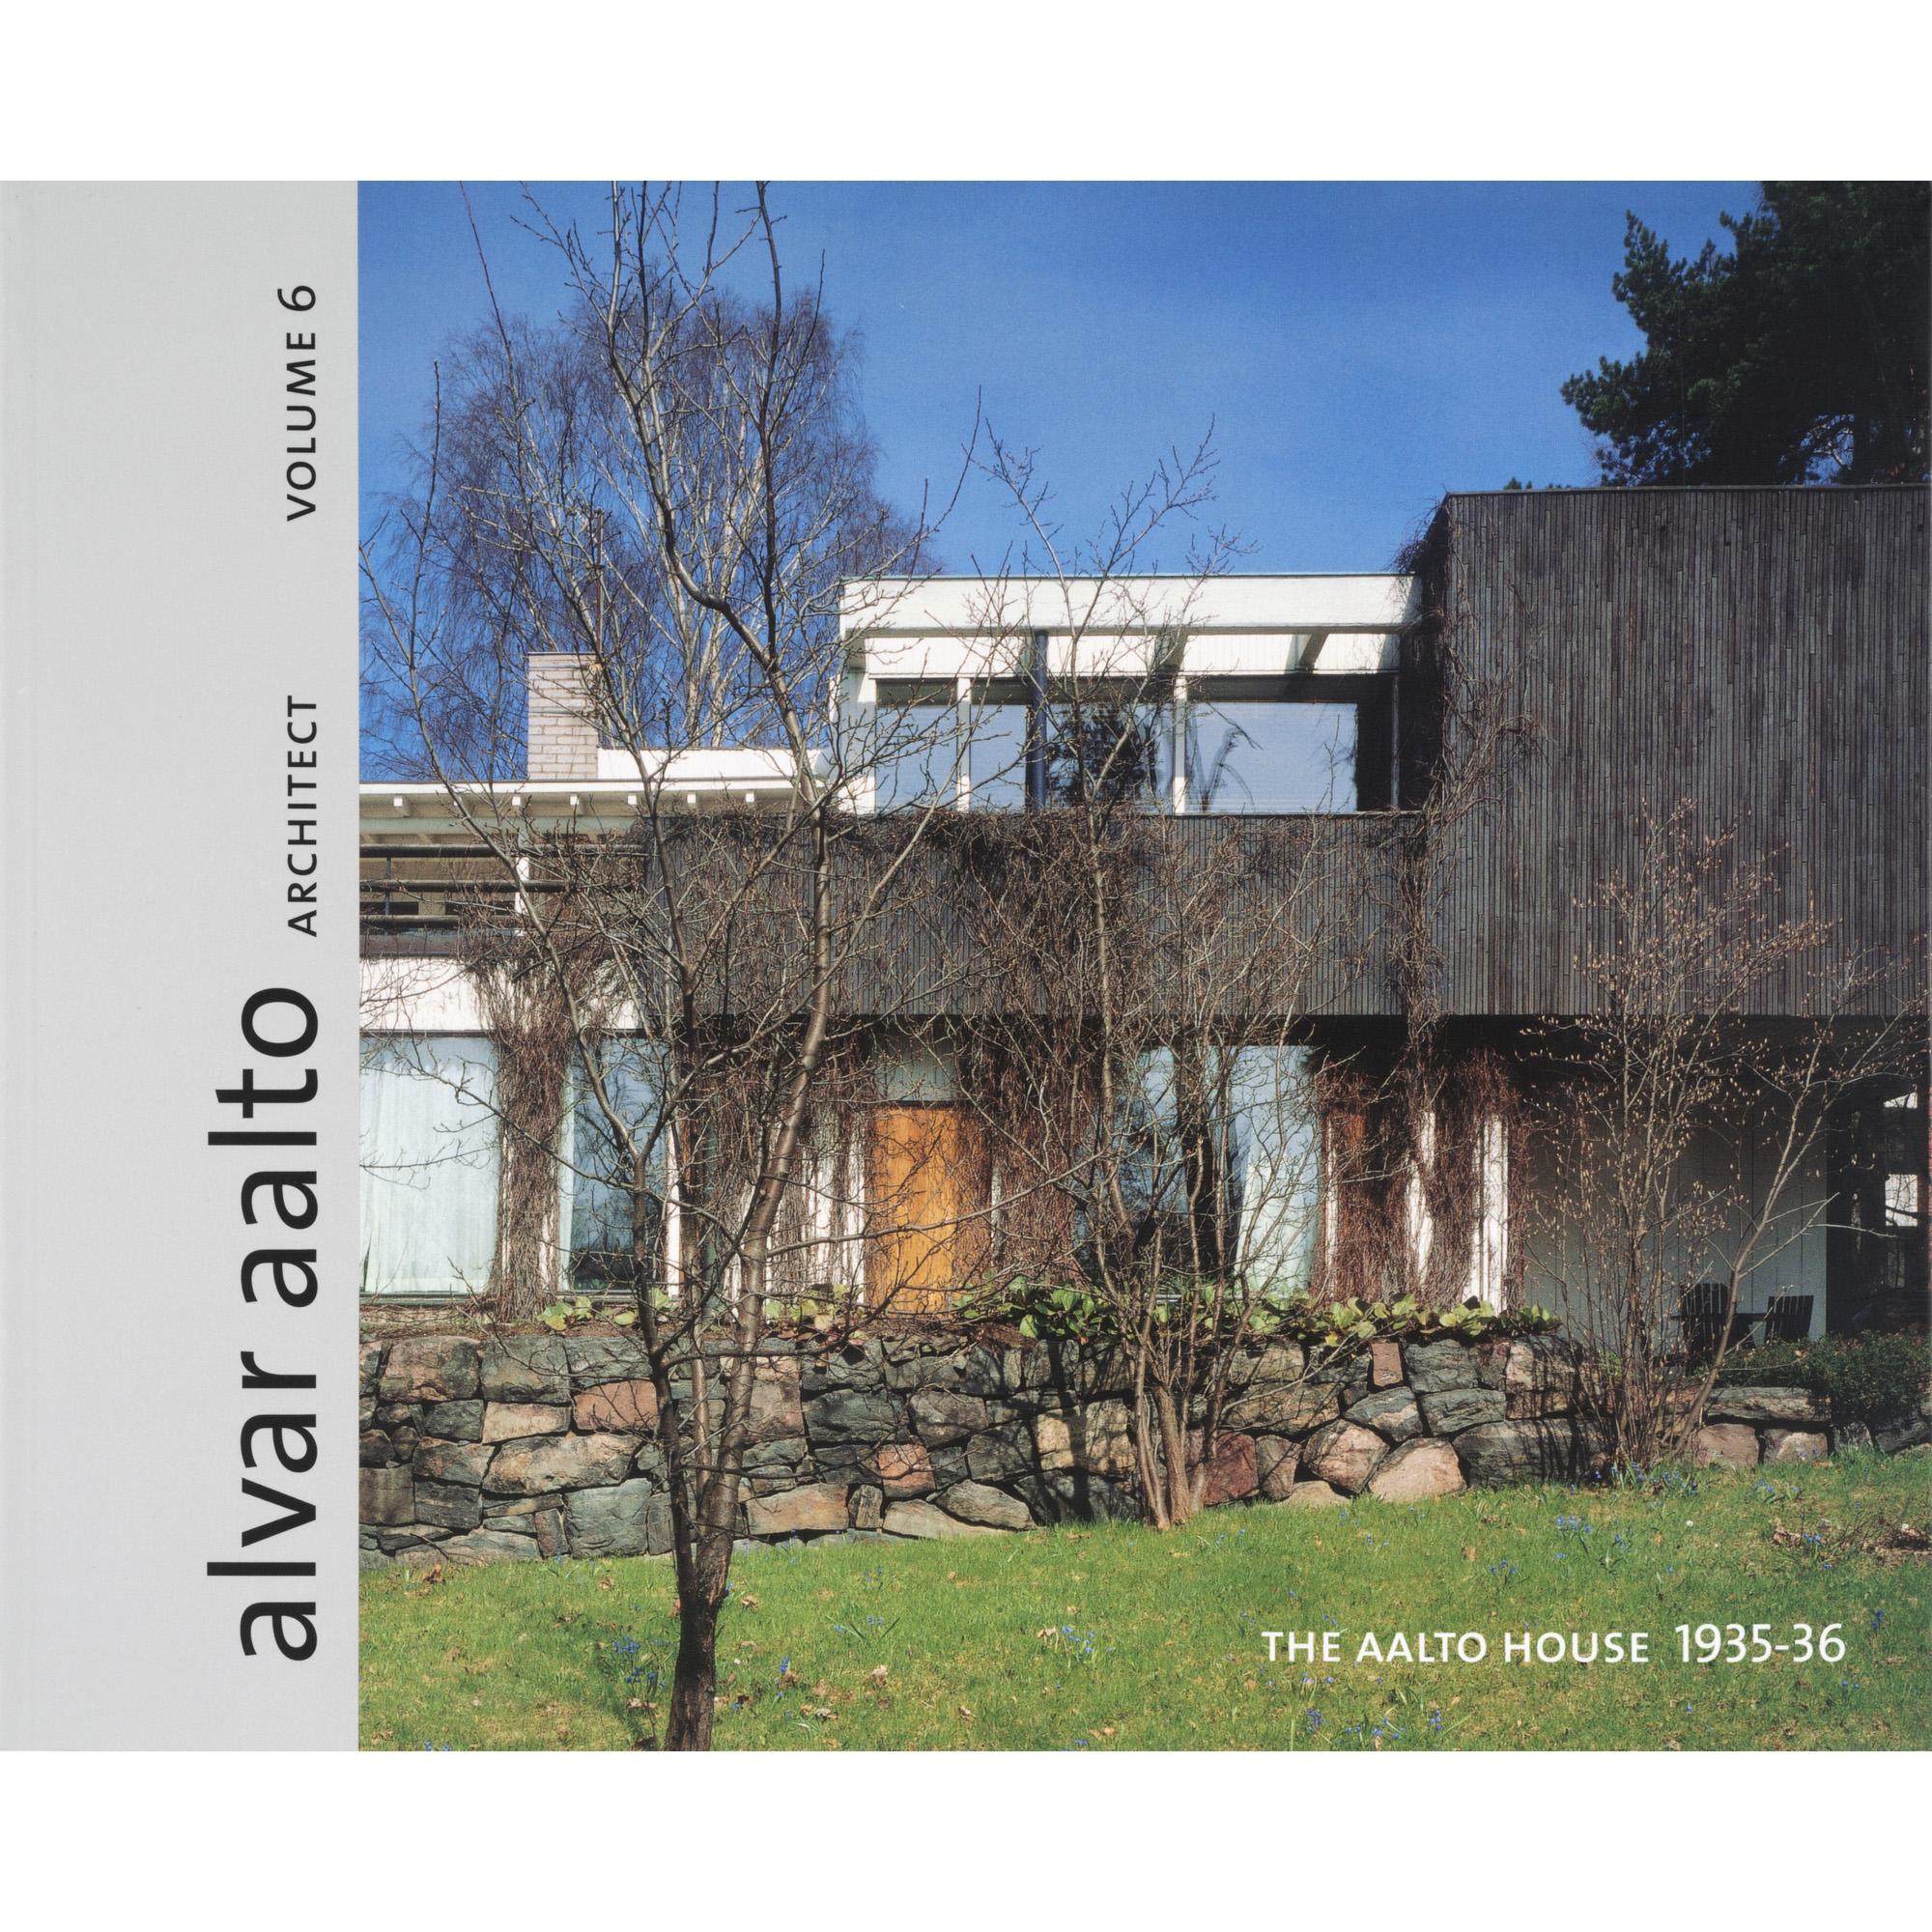 Alvar aalto architect volume 20 maison louis carr 1956 for The aalto house